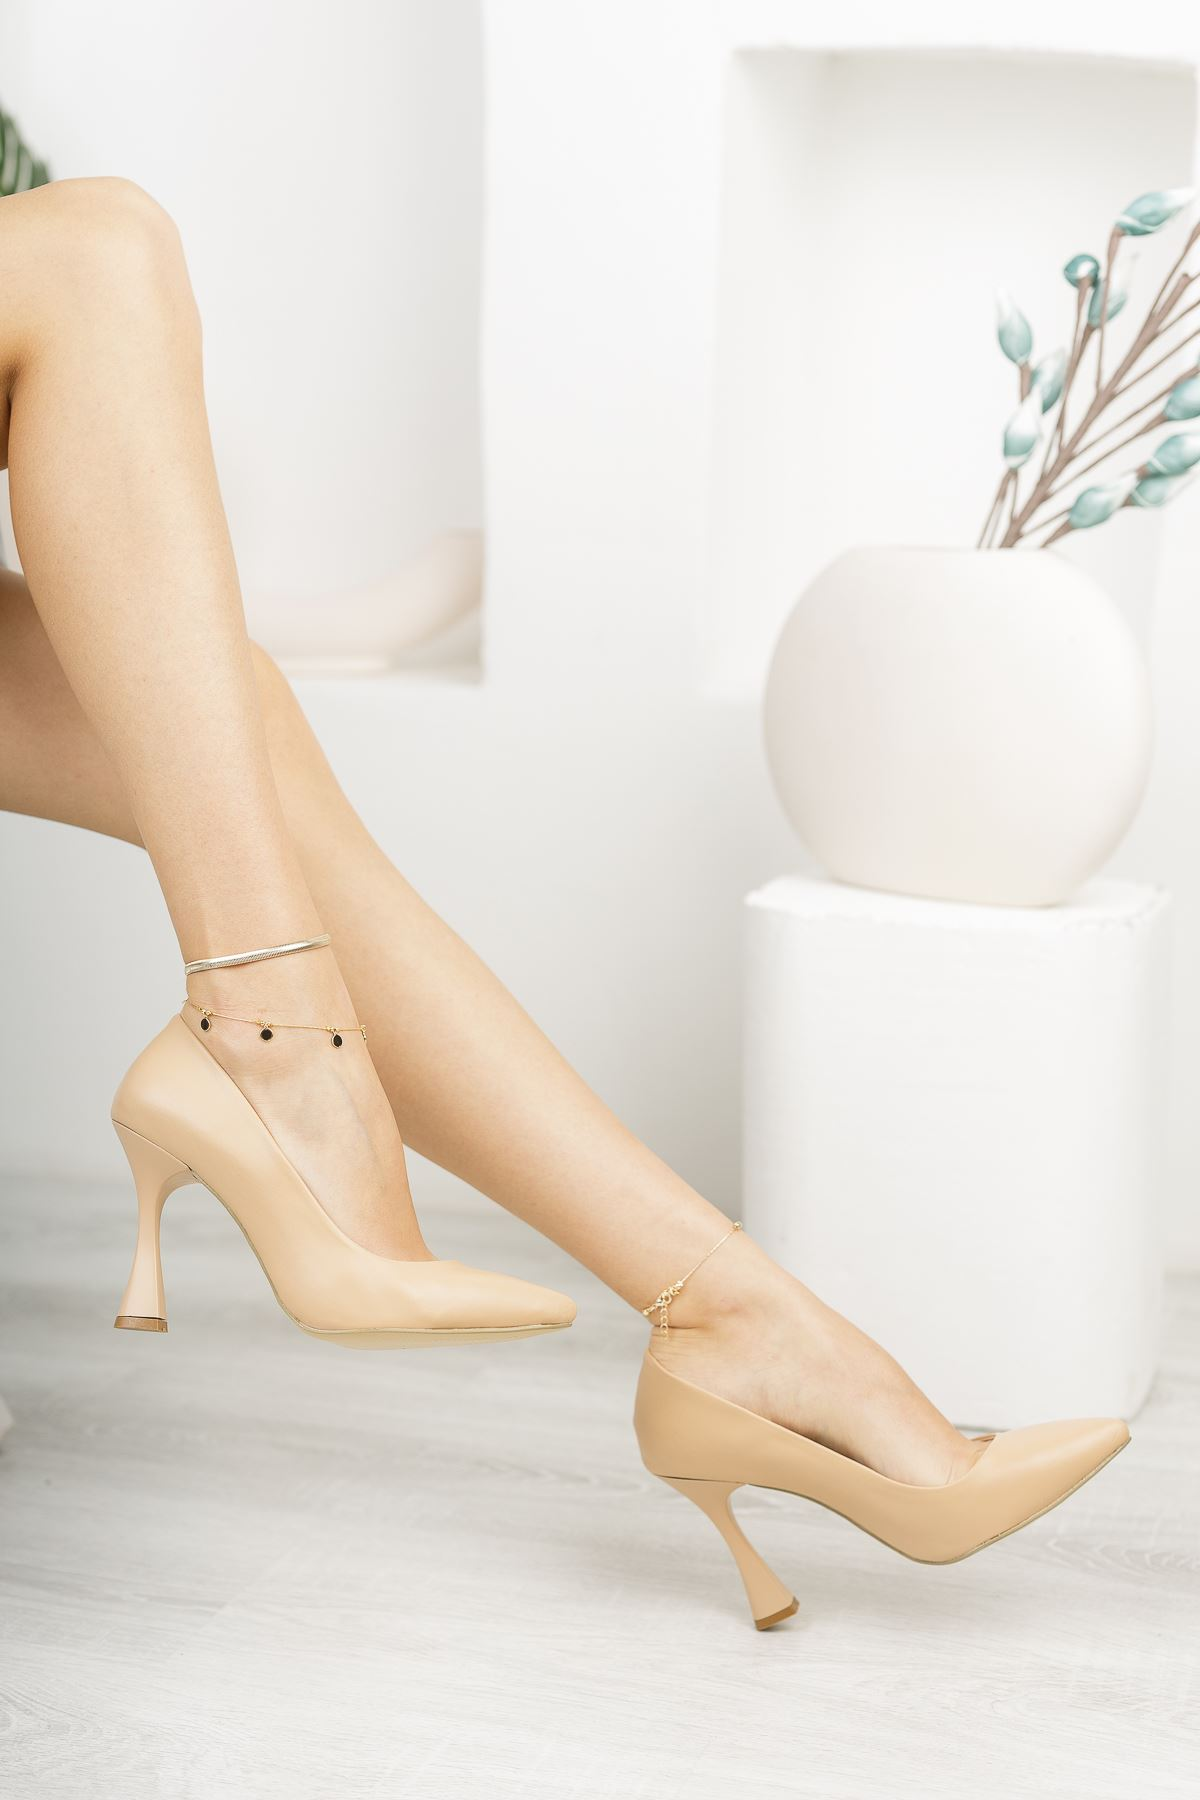 Nude Stiletto Topuklu Ayakkabı